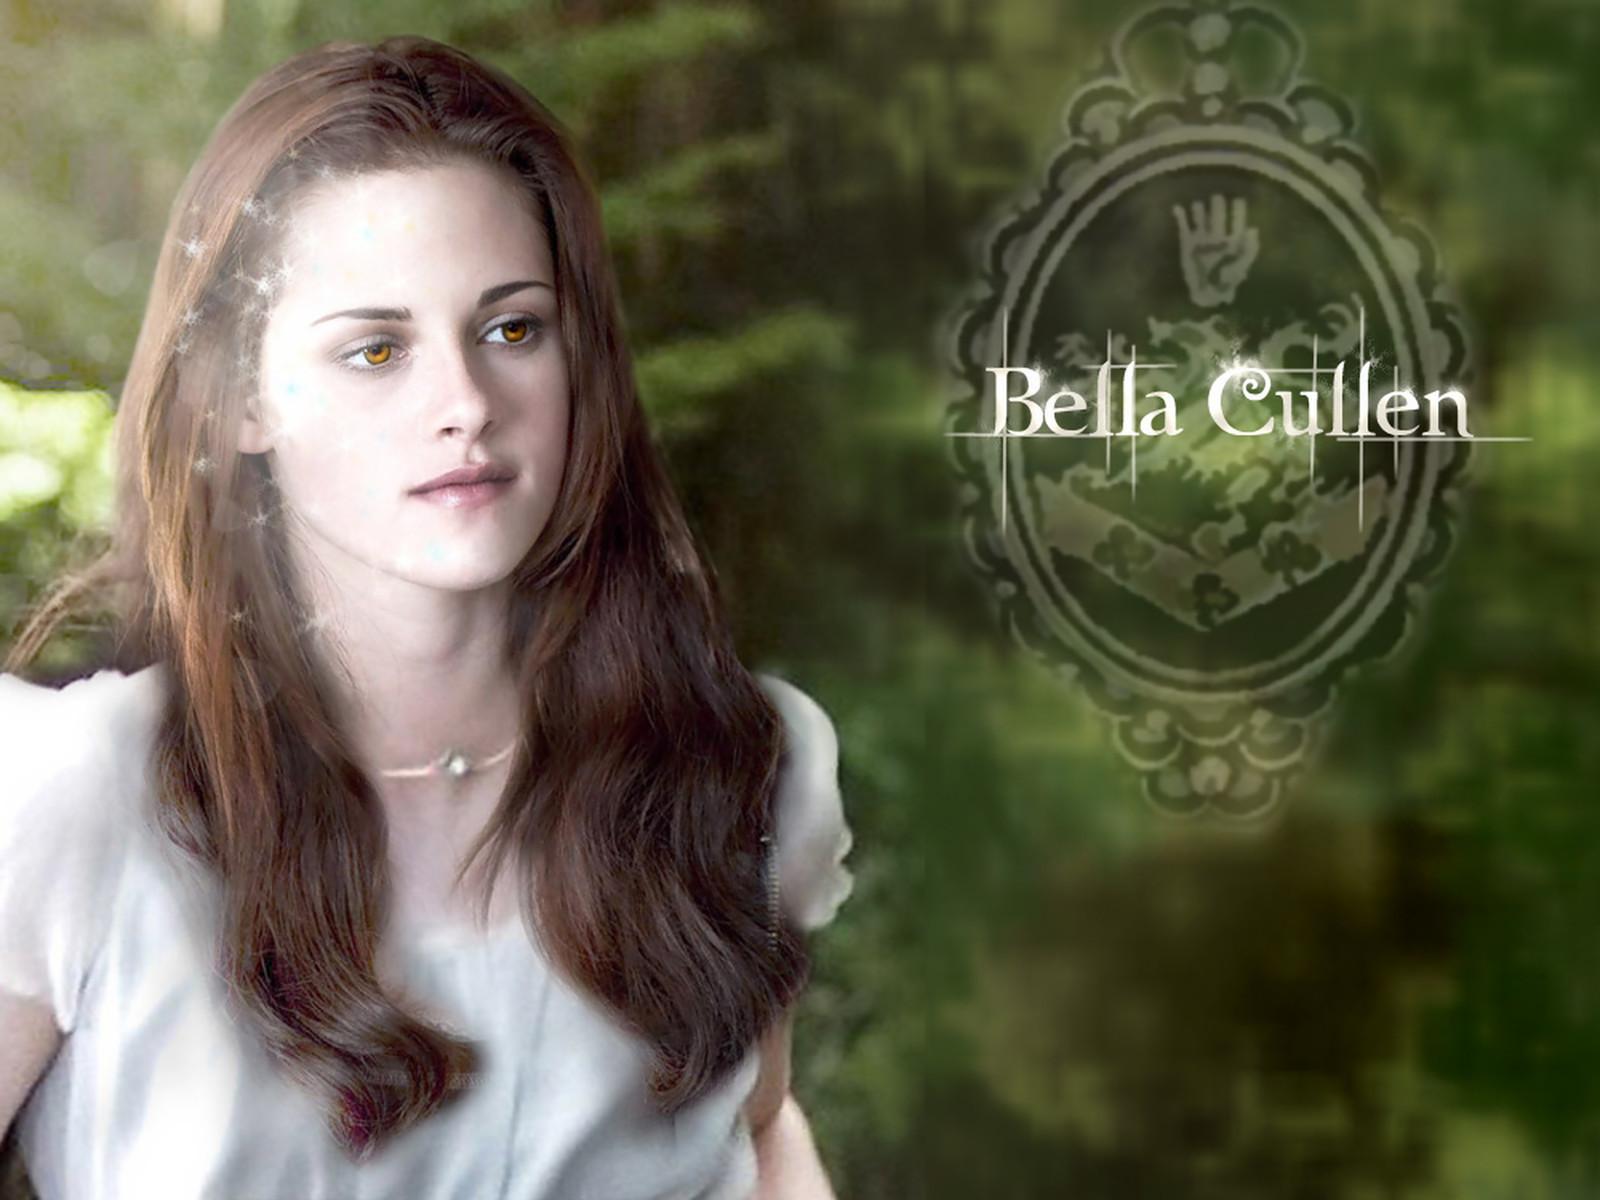 http://images2.fanpop.com/image/photos/9700000/Bella-Cullen-Breaking-Dawn-twilight-series-9789086-1600-1200.jpg